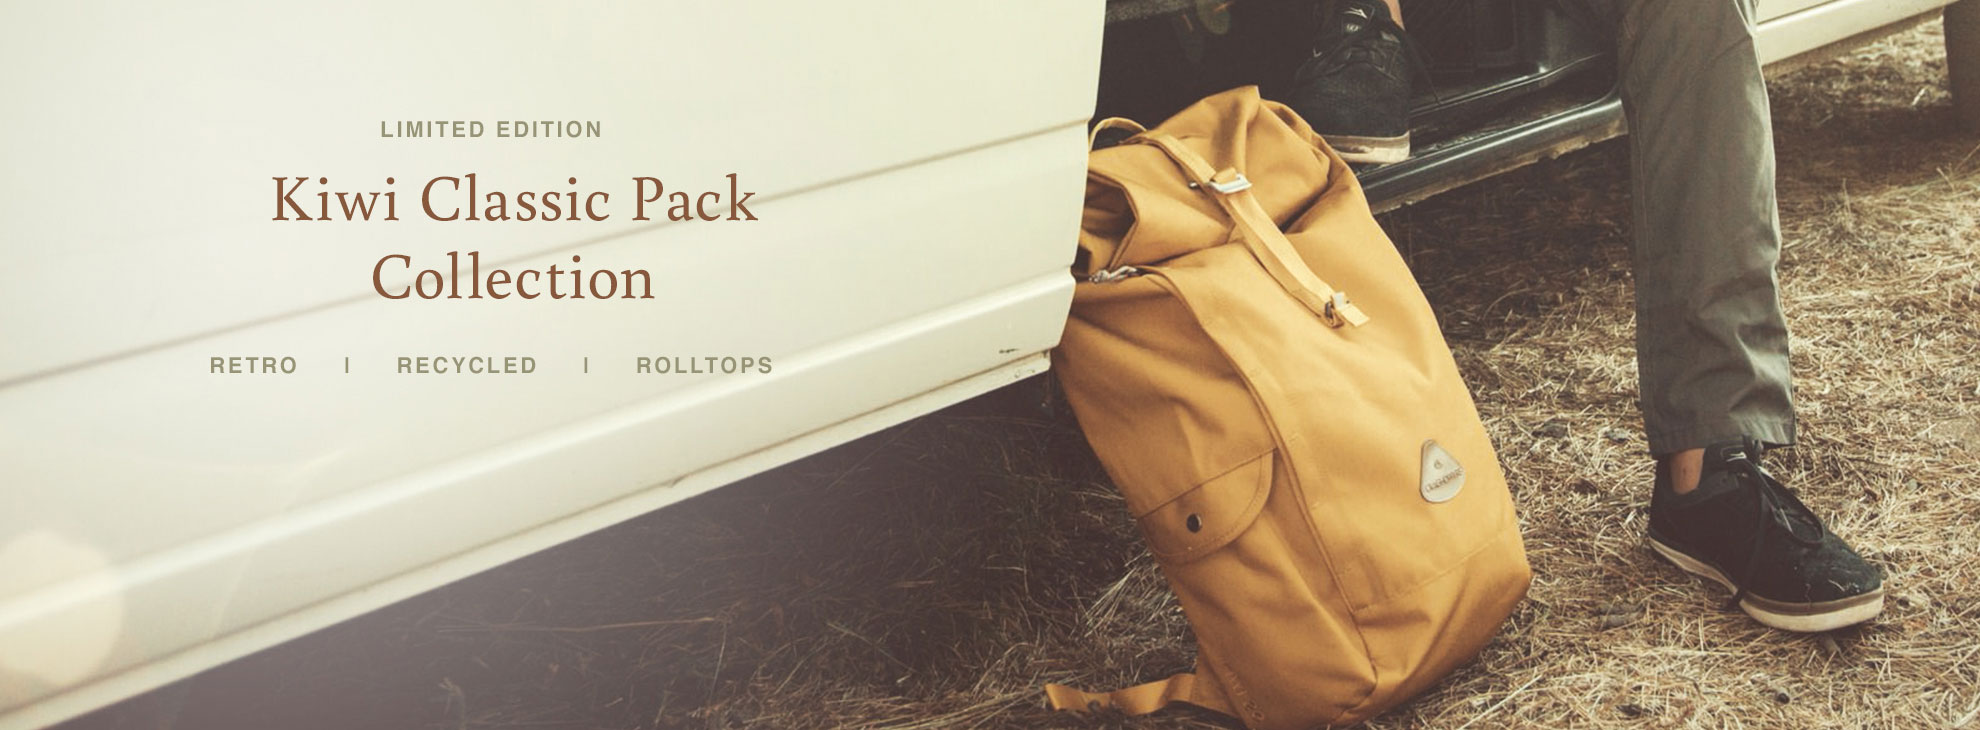 Kiwi Packs